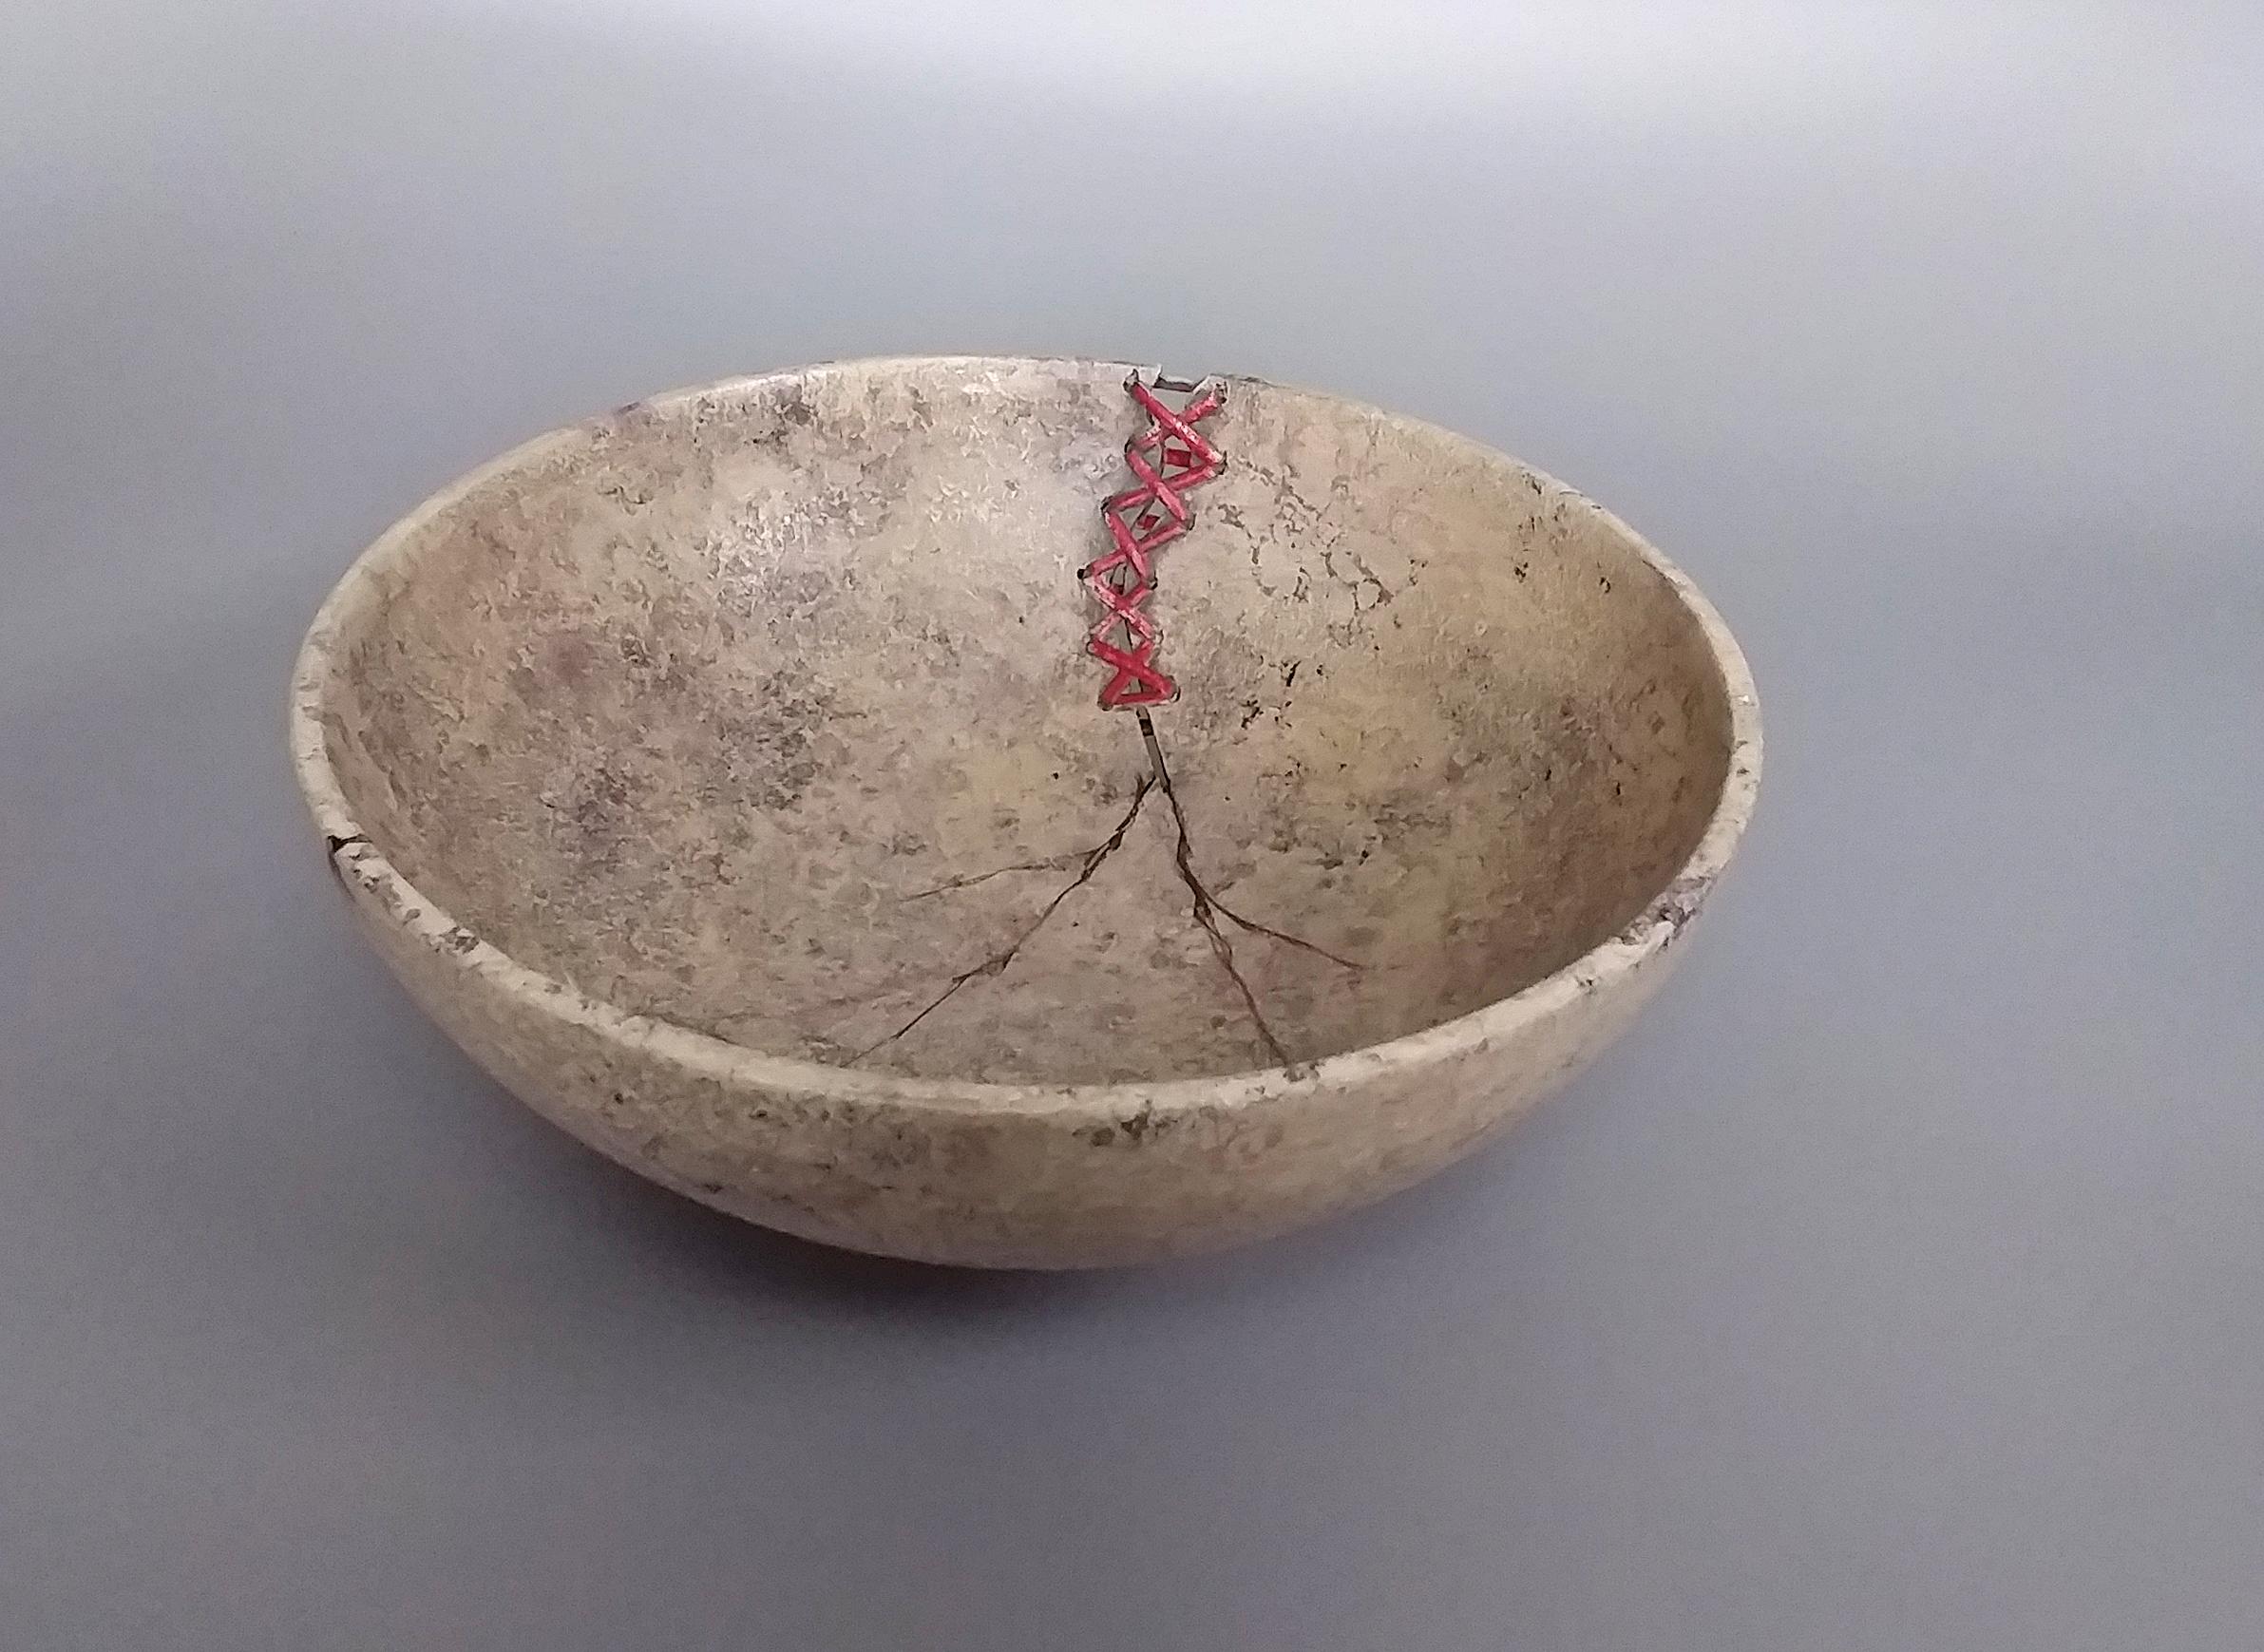 Lace Up Bowl